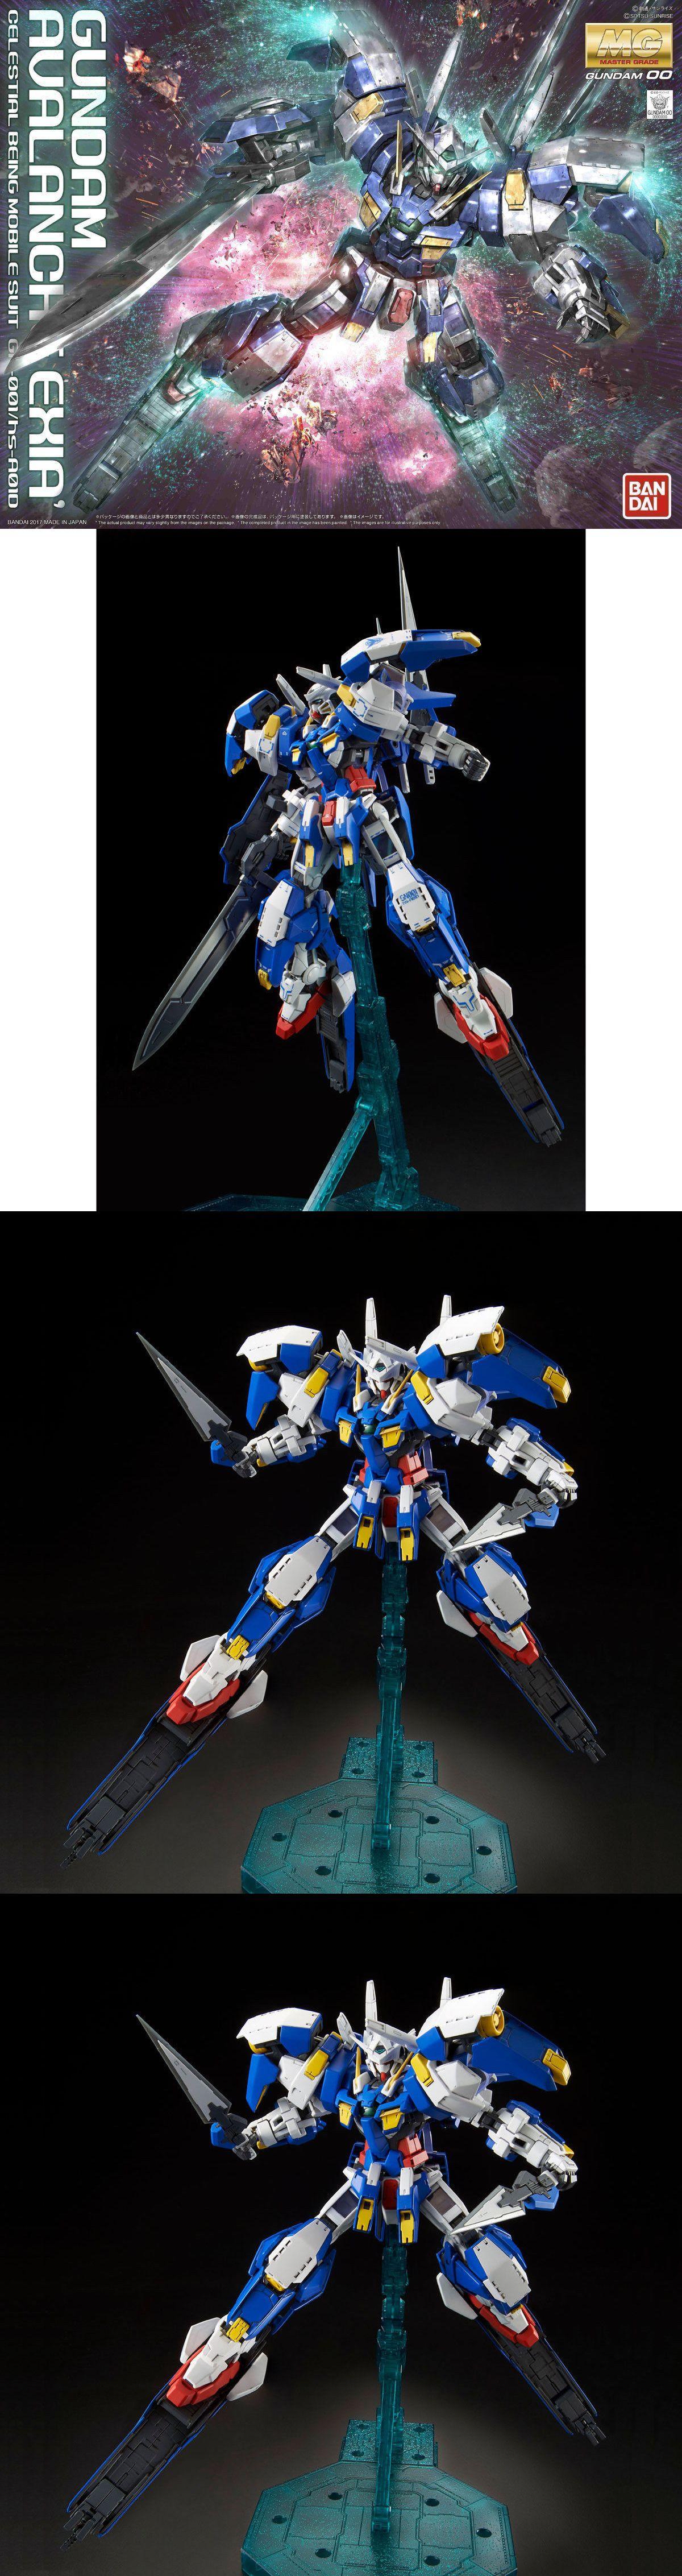 Models And Kits 1188 Gundam 1 100 Mg Gundam 00 Avalanche Exia Dash Model Kit Exclusive Usa In Stock Buy It Now Only 76 99 On Ebay Model Kit Gundam Model